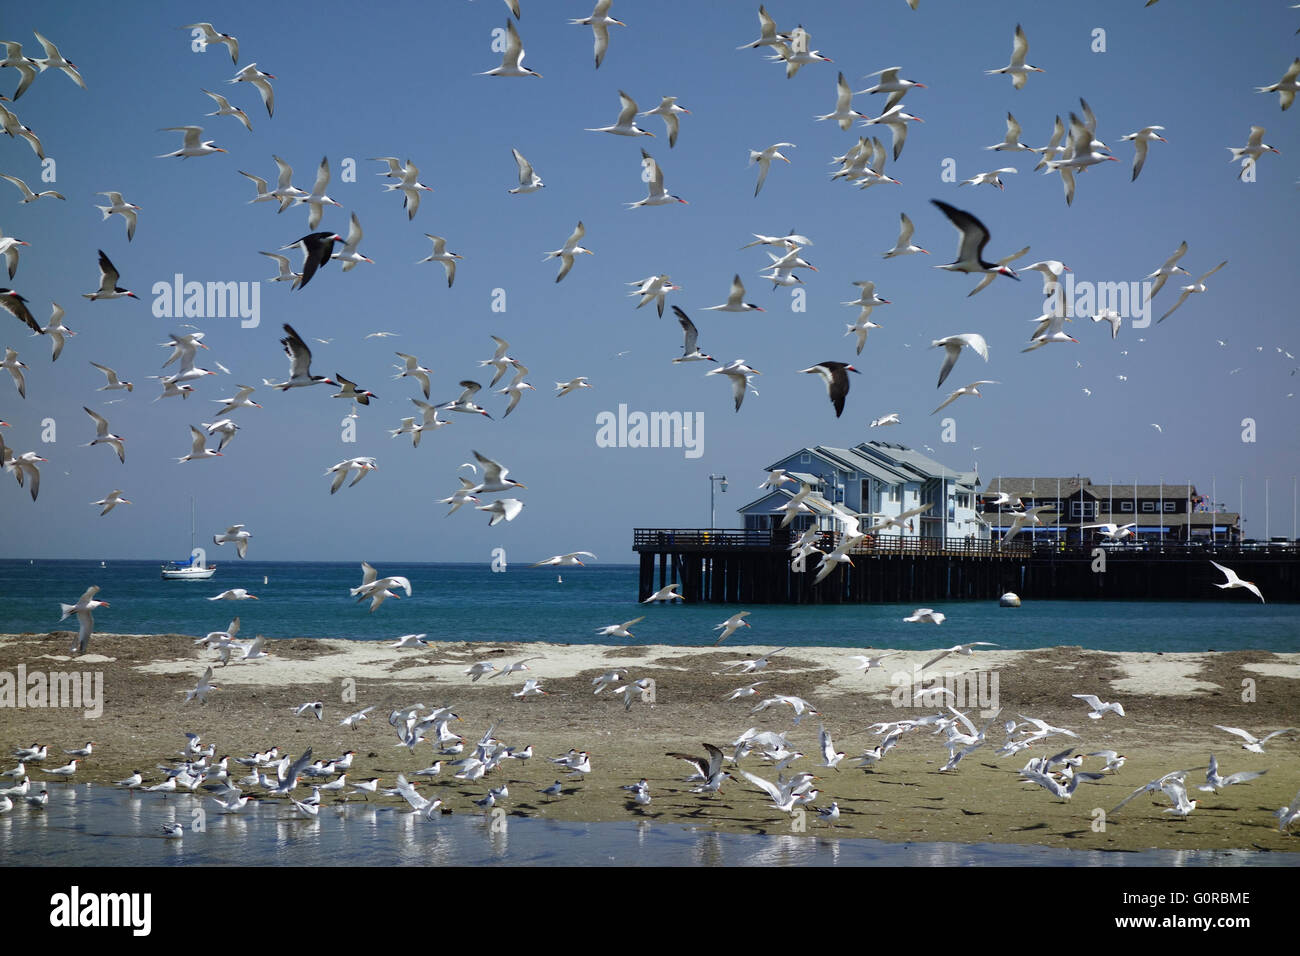 sea birds and gulls in flight near beach beside Stearns Wharf in Santa Barbara Southern California USA - Stock Image